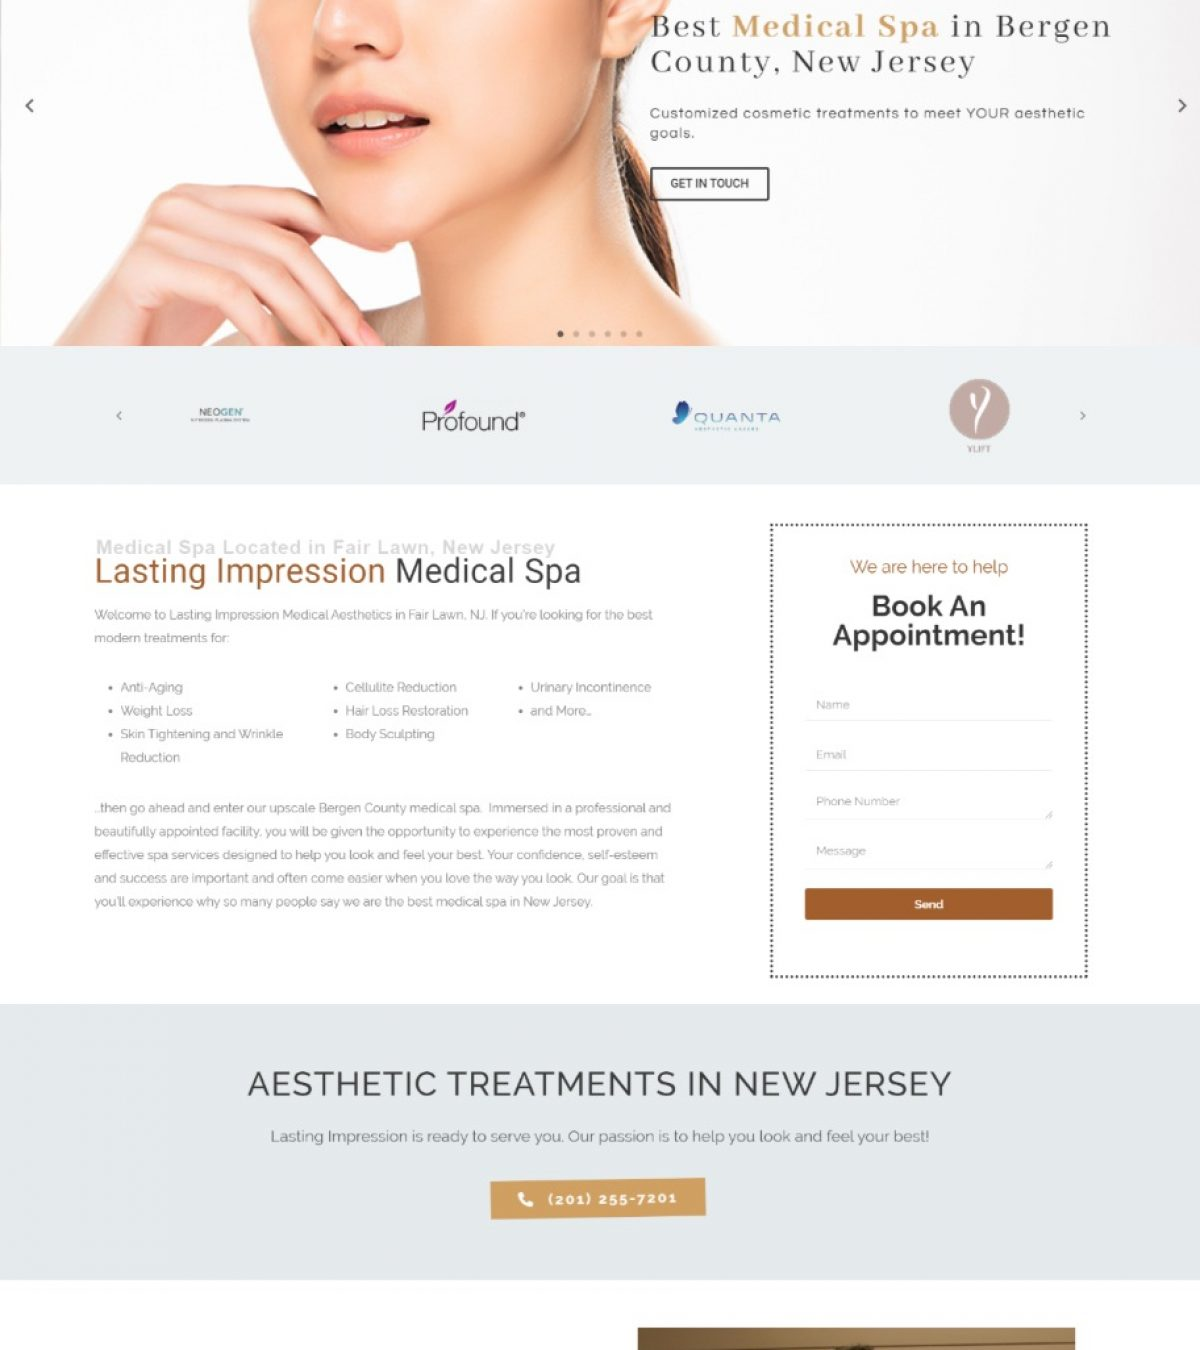 bergencountymedicalspa-website